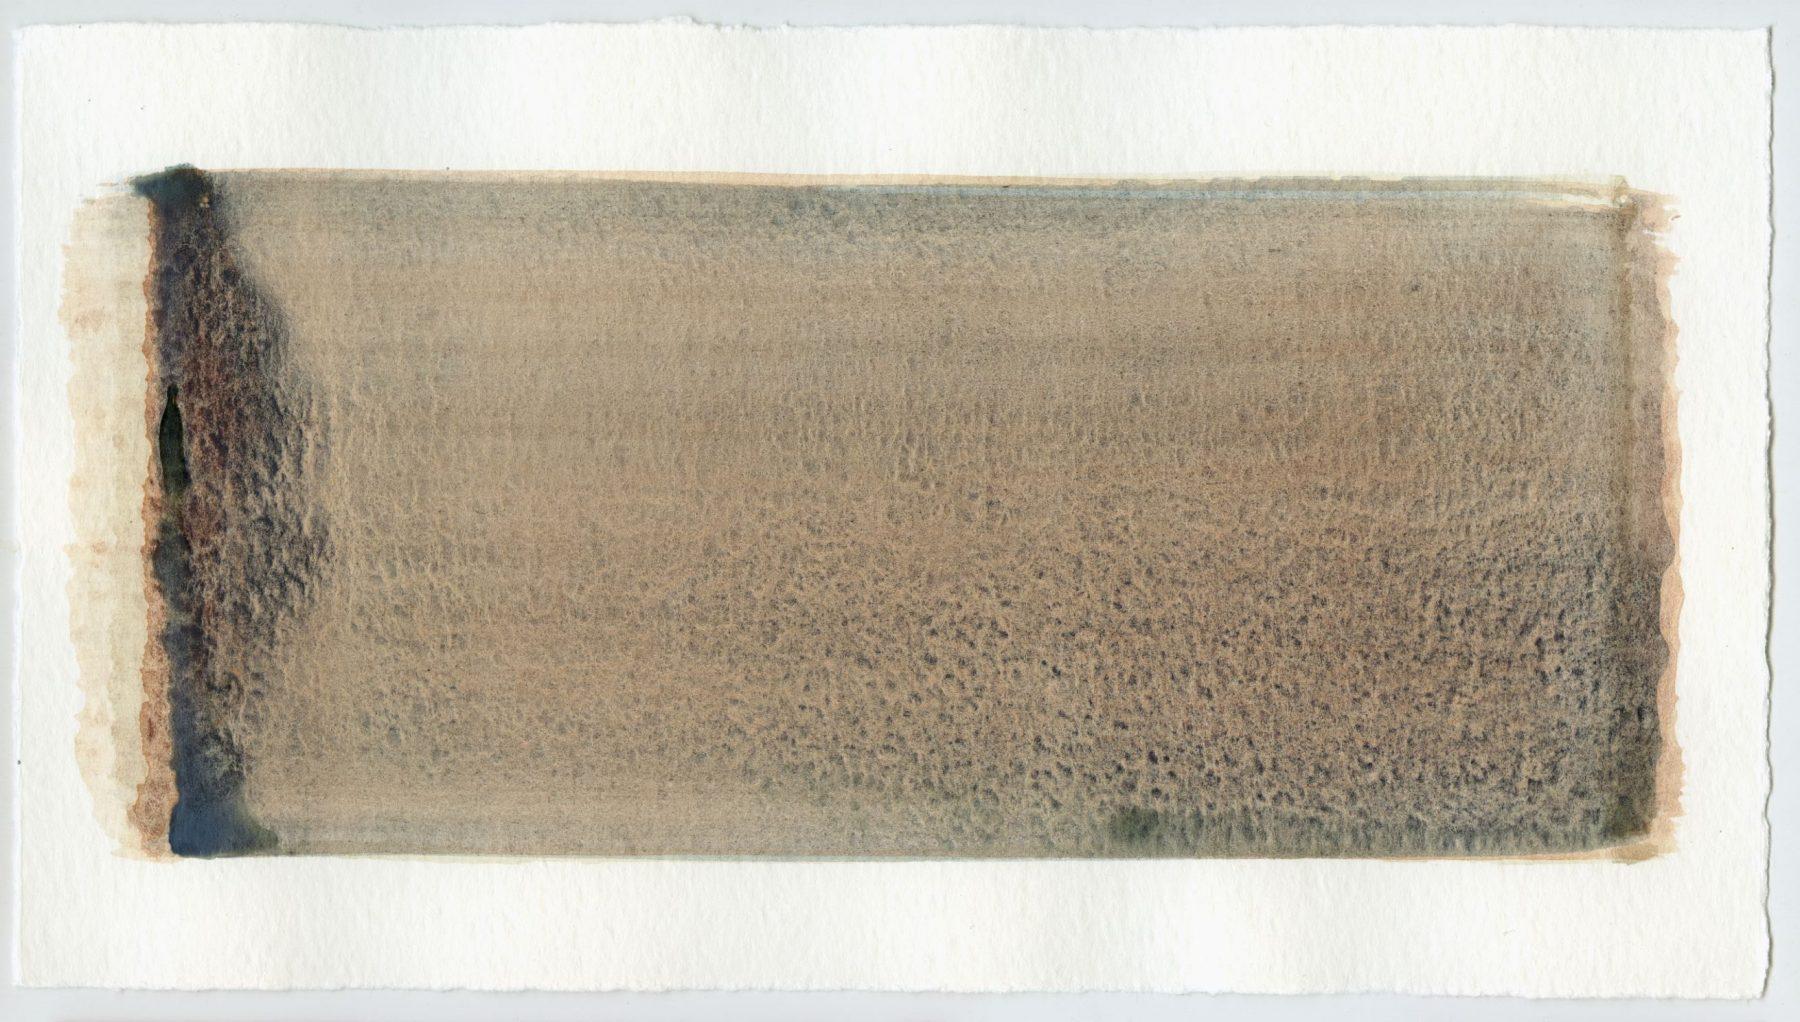 Brush stroke no. 112 - Pigment: Vivianiet (from Kremer Pigmente) Selfmade pigment: IJzeroer gebrand